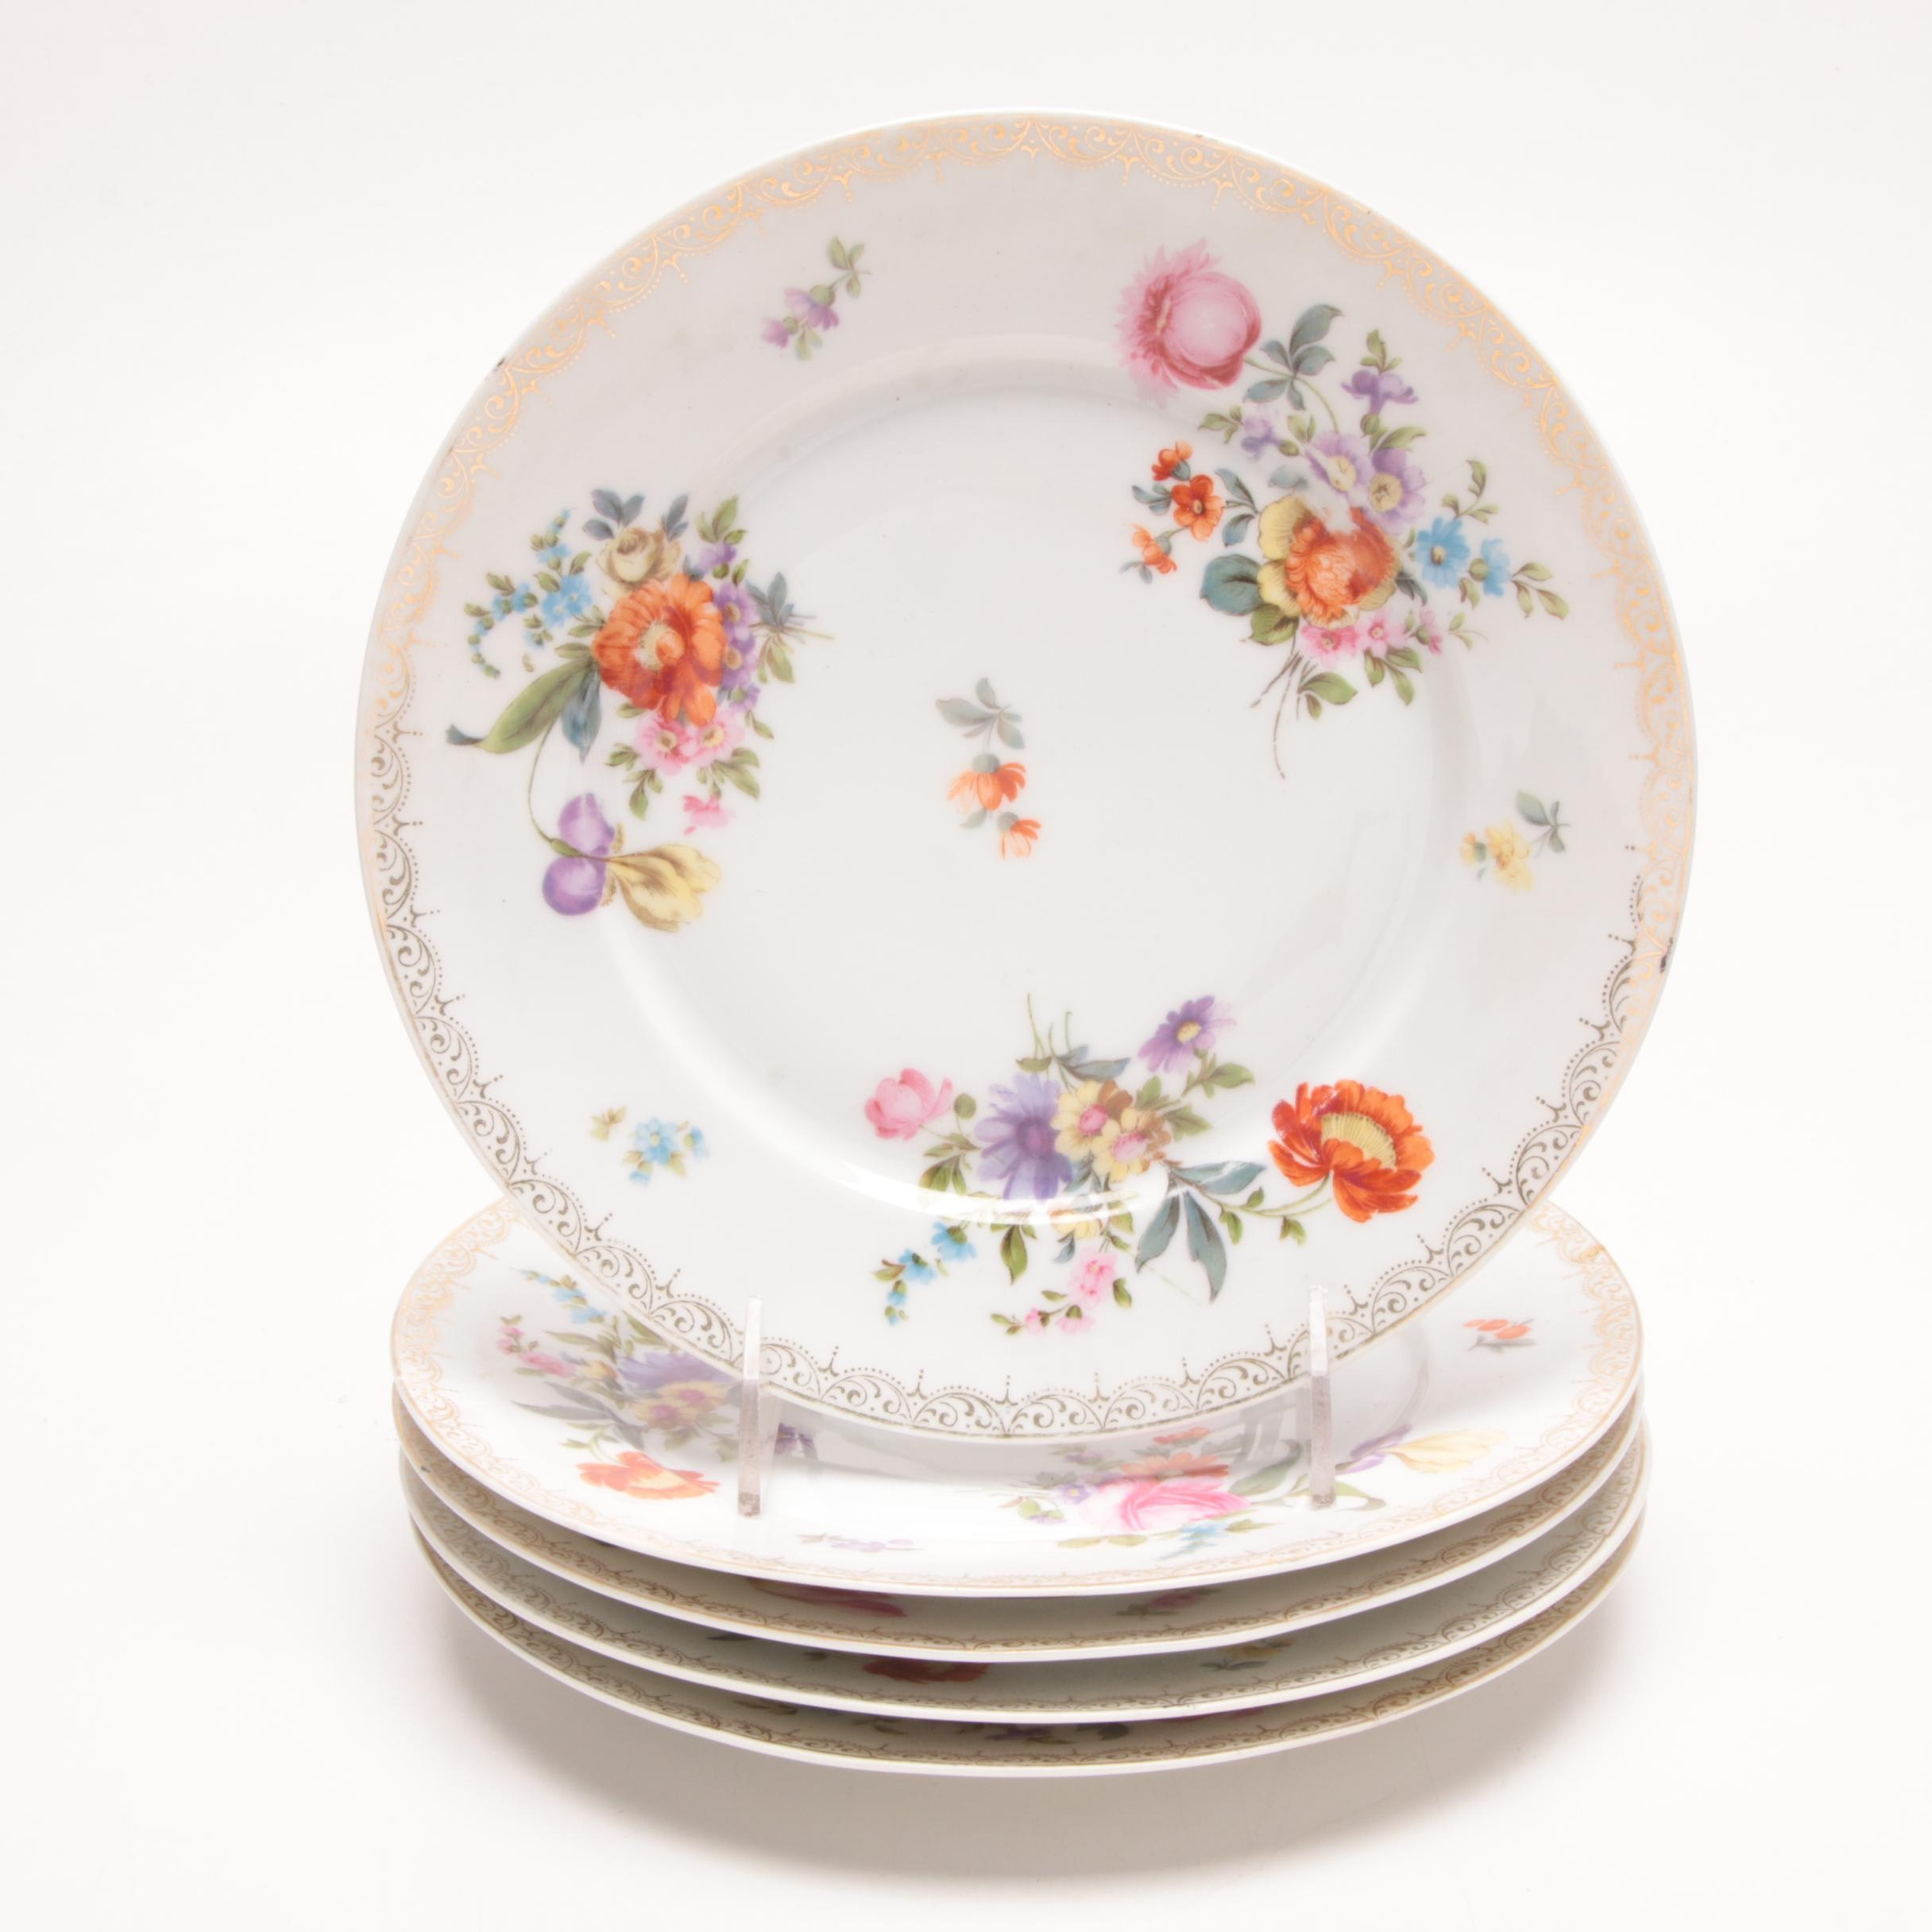 German Z.S. & Co. Porcelain Salad Plates